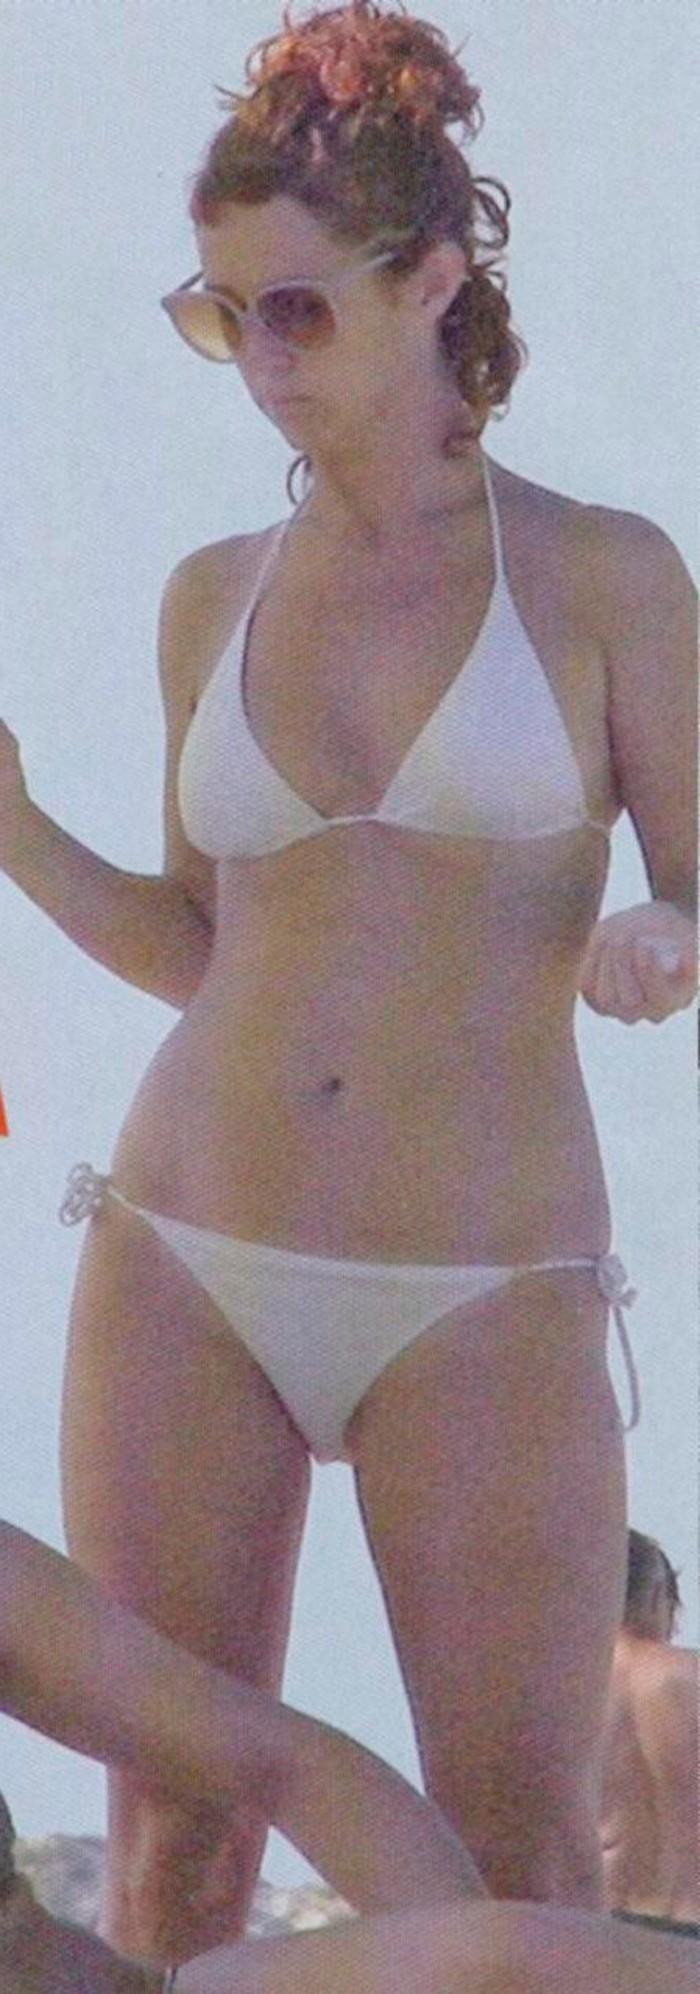 Marta Belenguer bikini playa